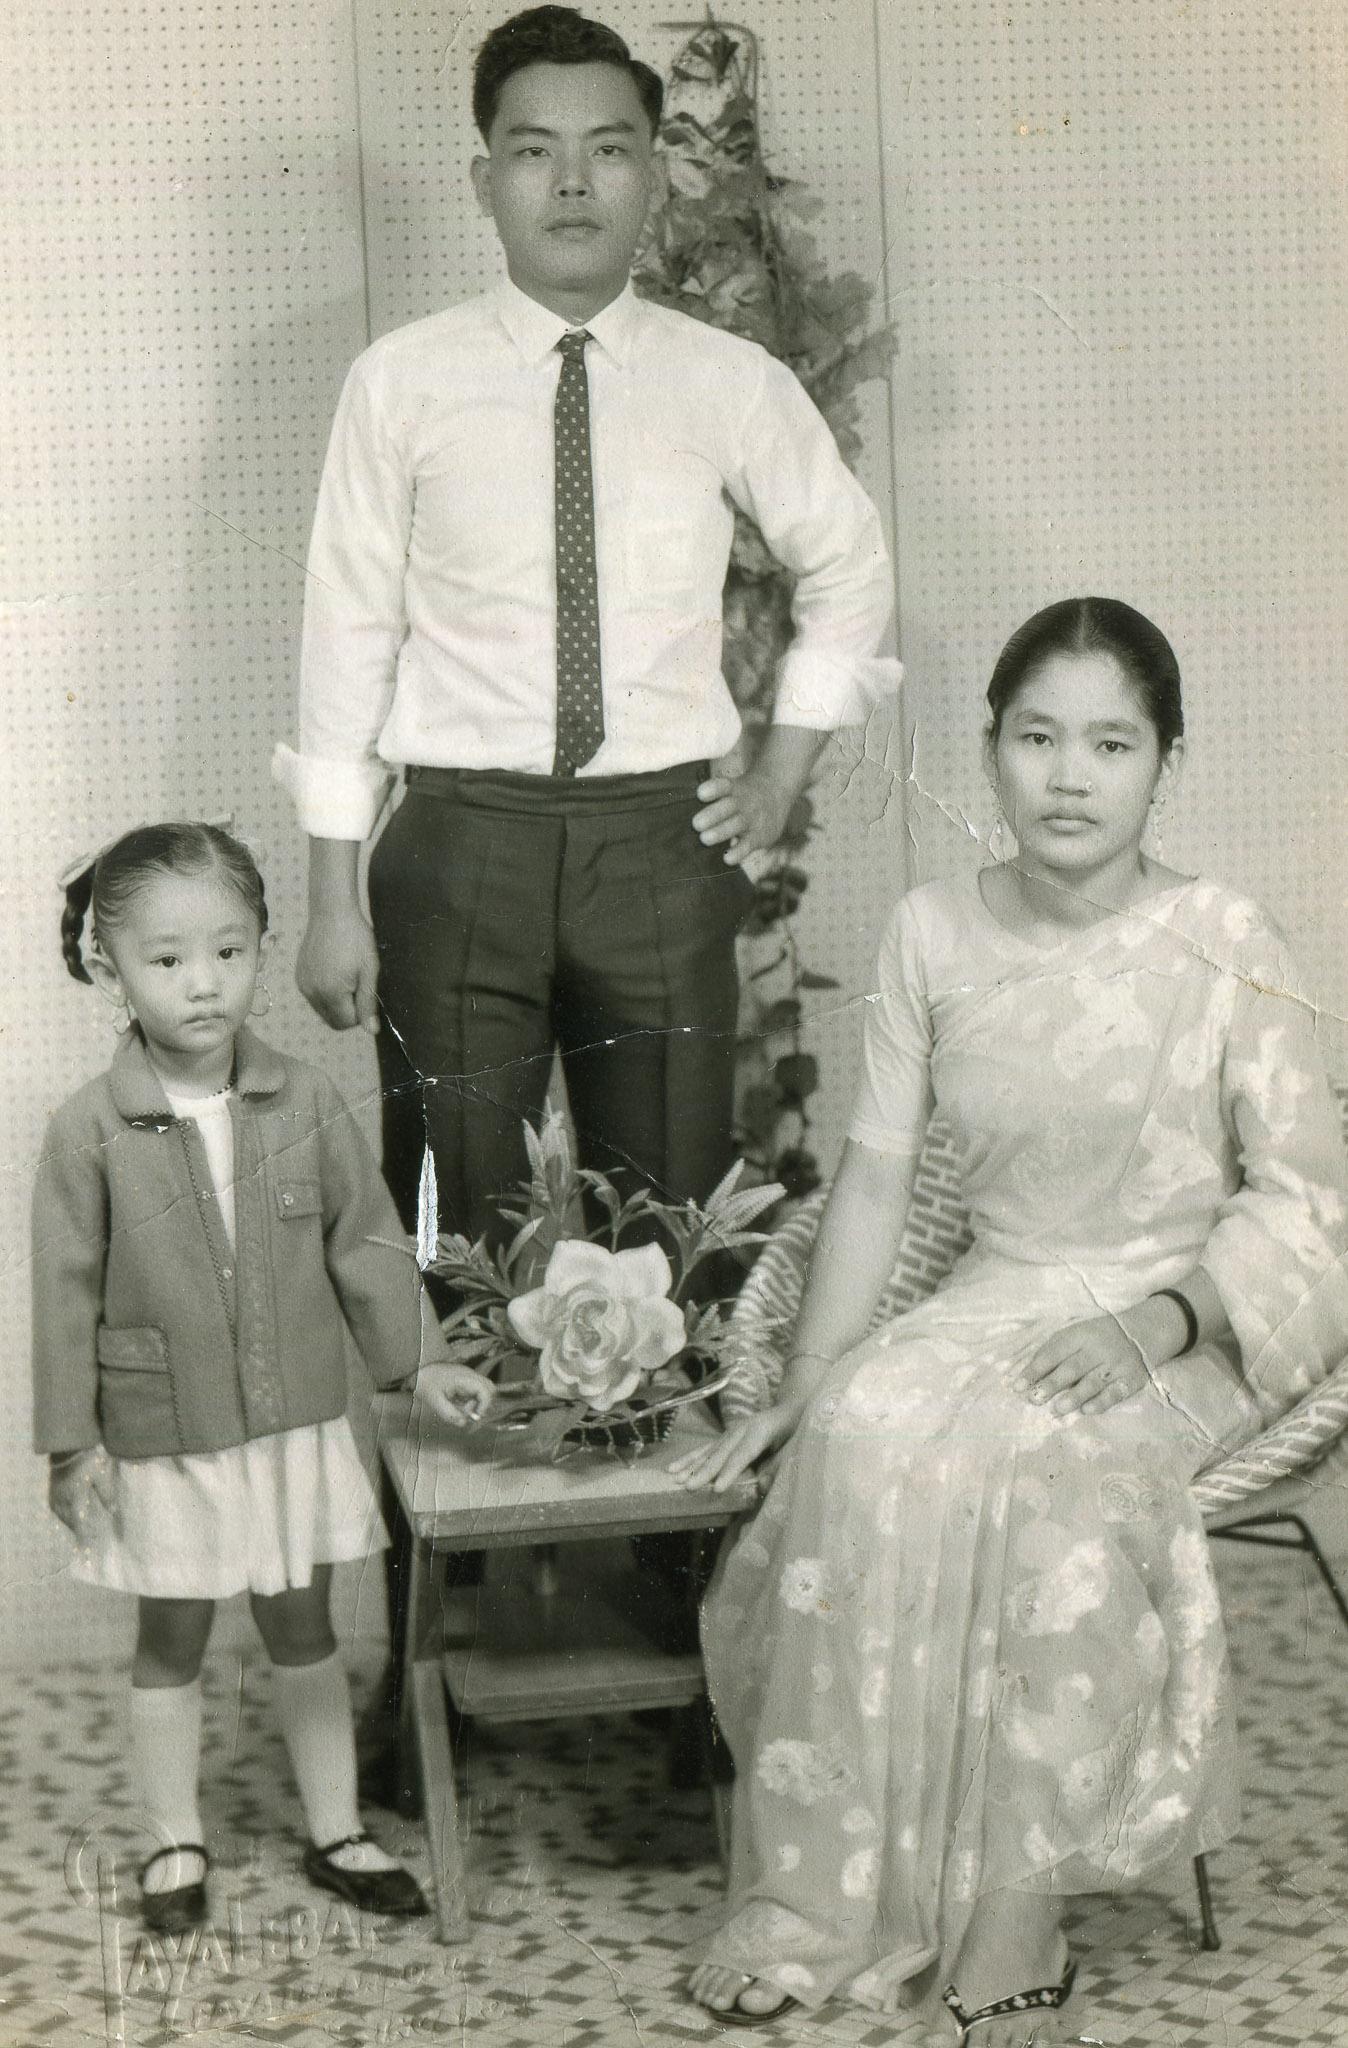 singapore-gurkhas-archive-photo-museum-zakaria-zainal-48.jpg